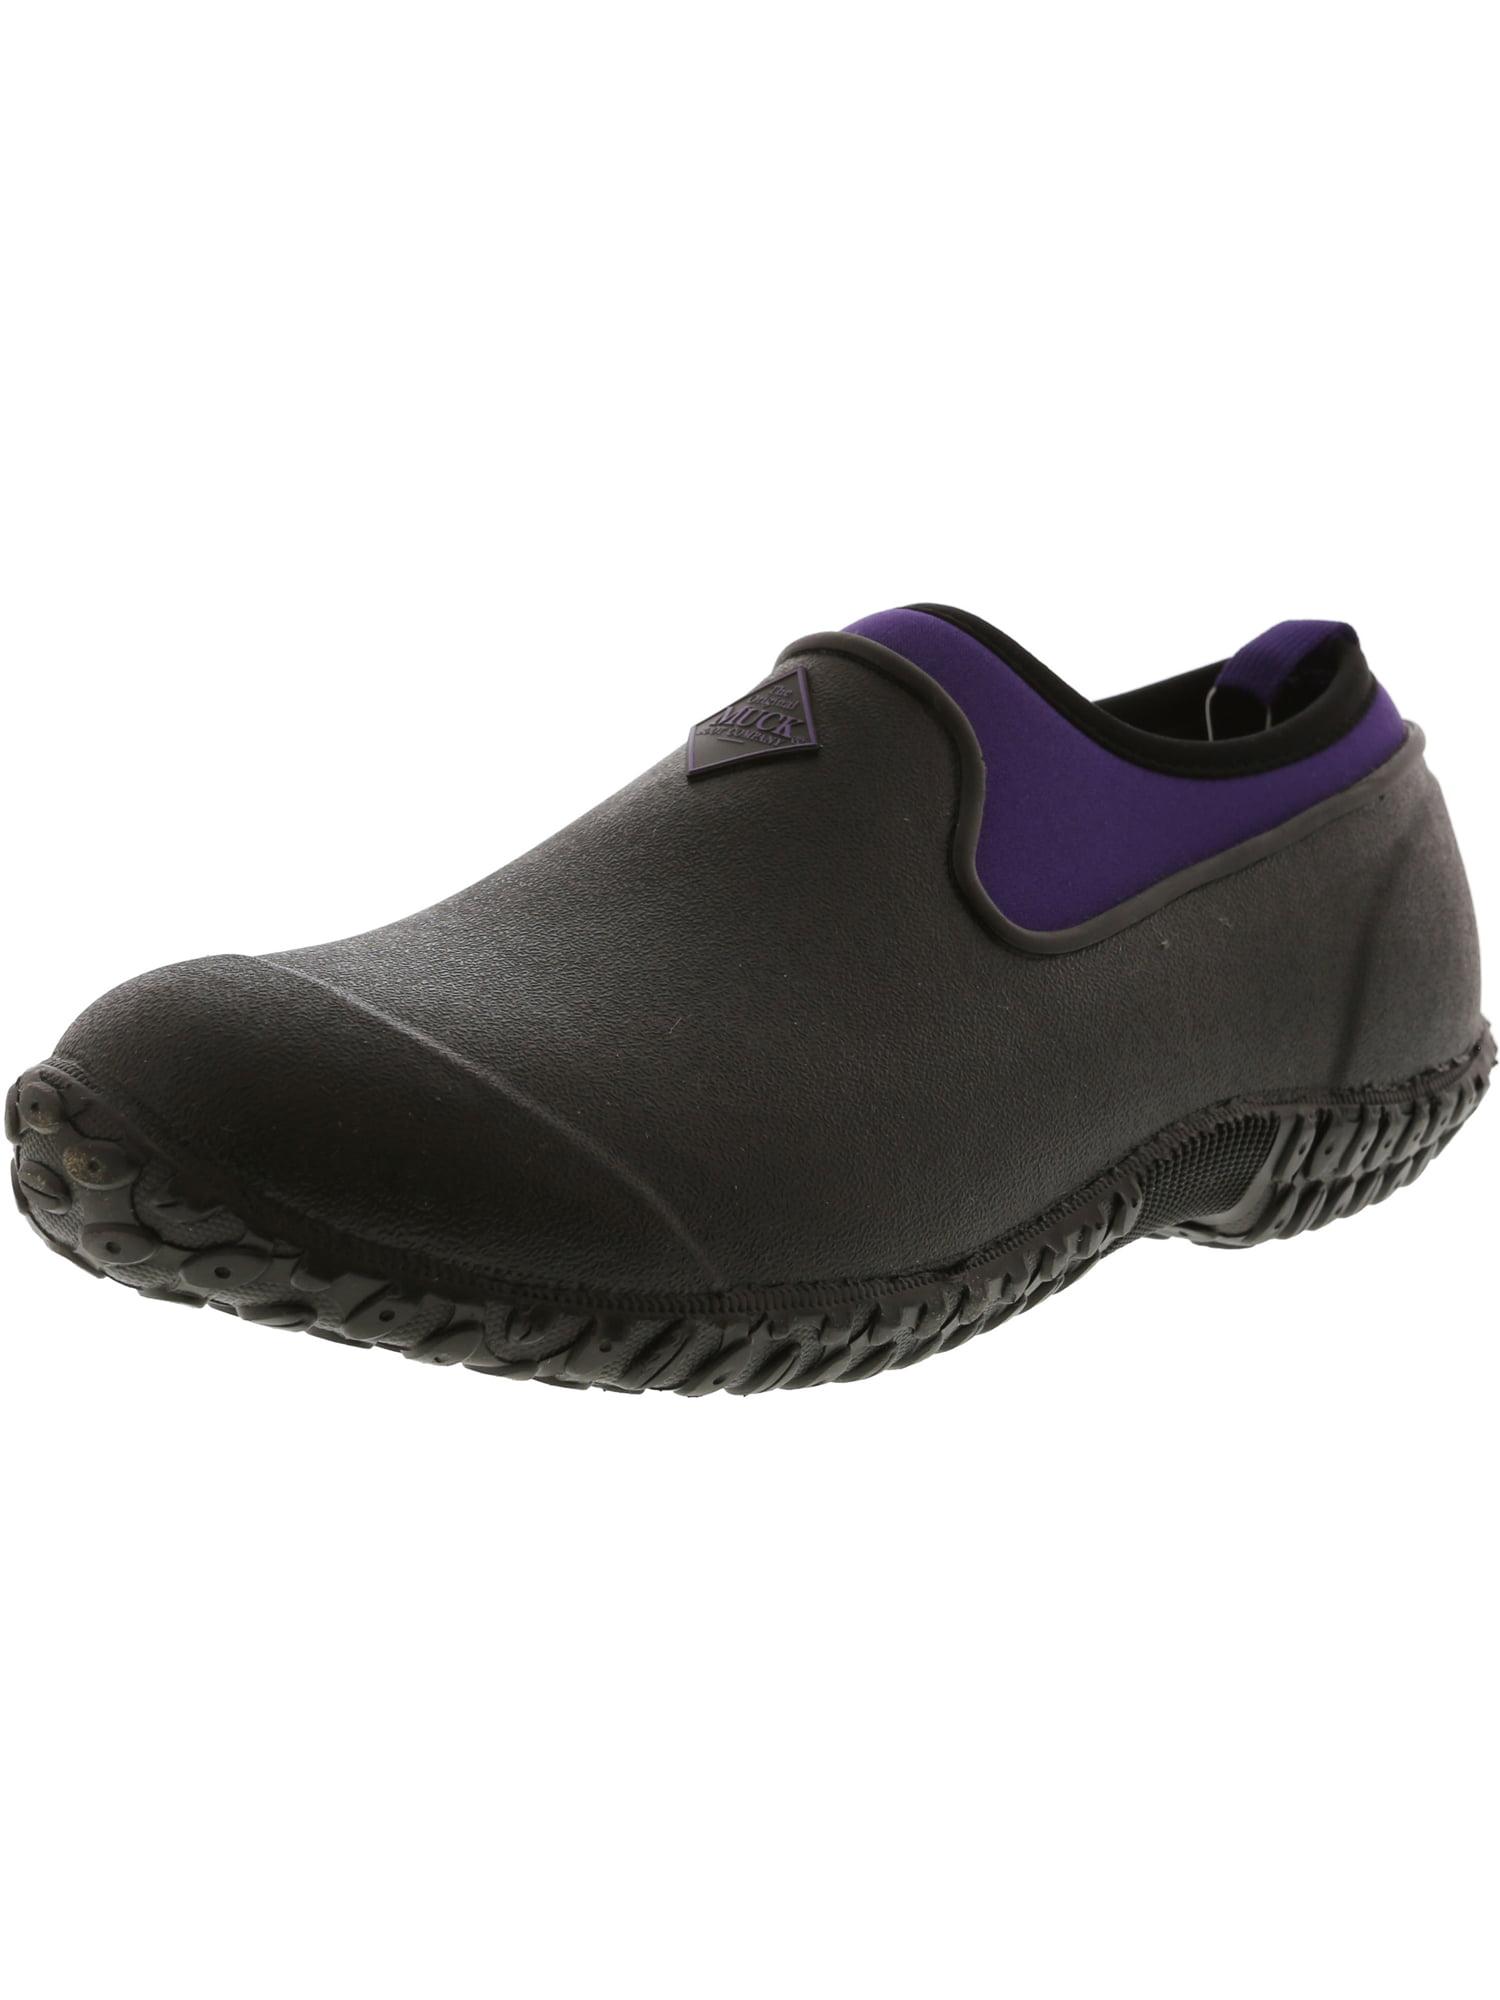 Muck Boot Company Women's Muckster Ii Low Black / Purple Ankle-High Rubber Rain Shoe - 7M